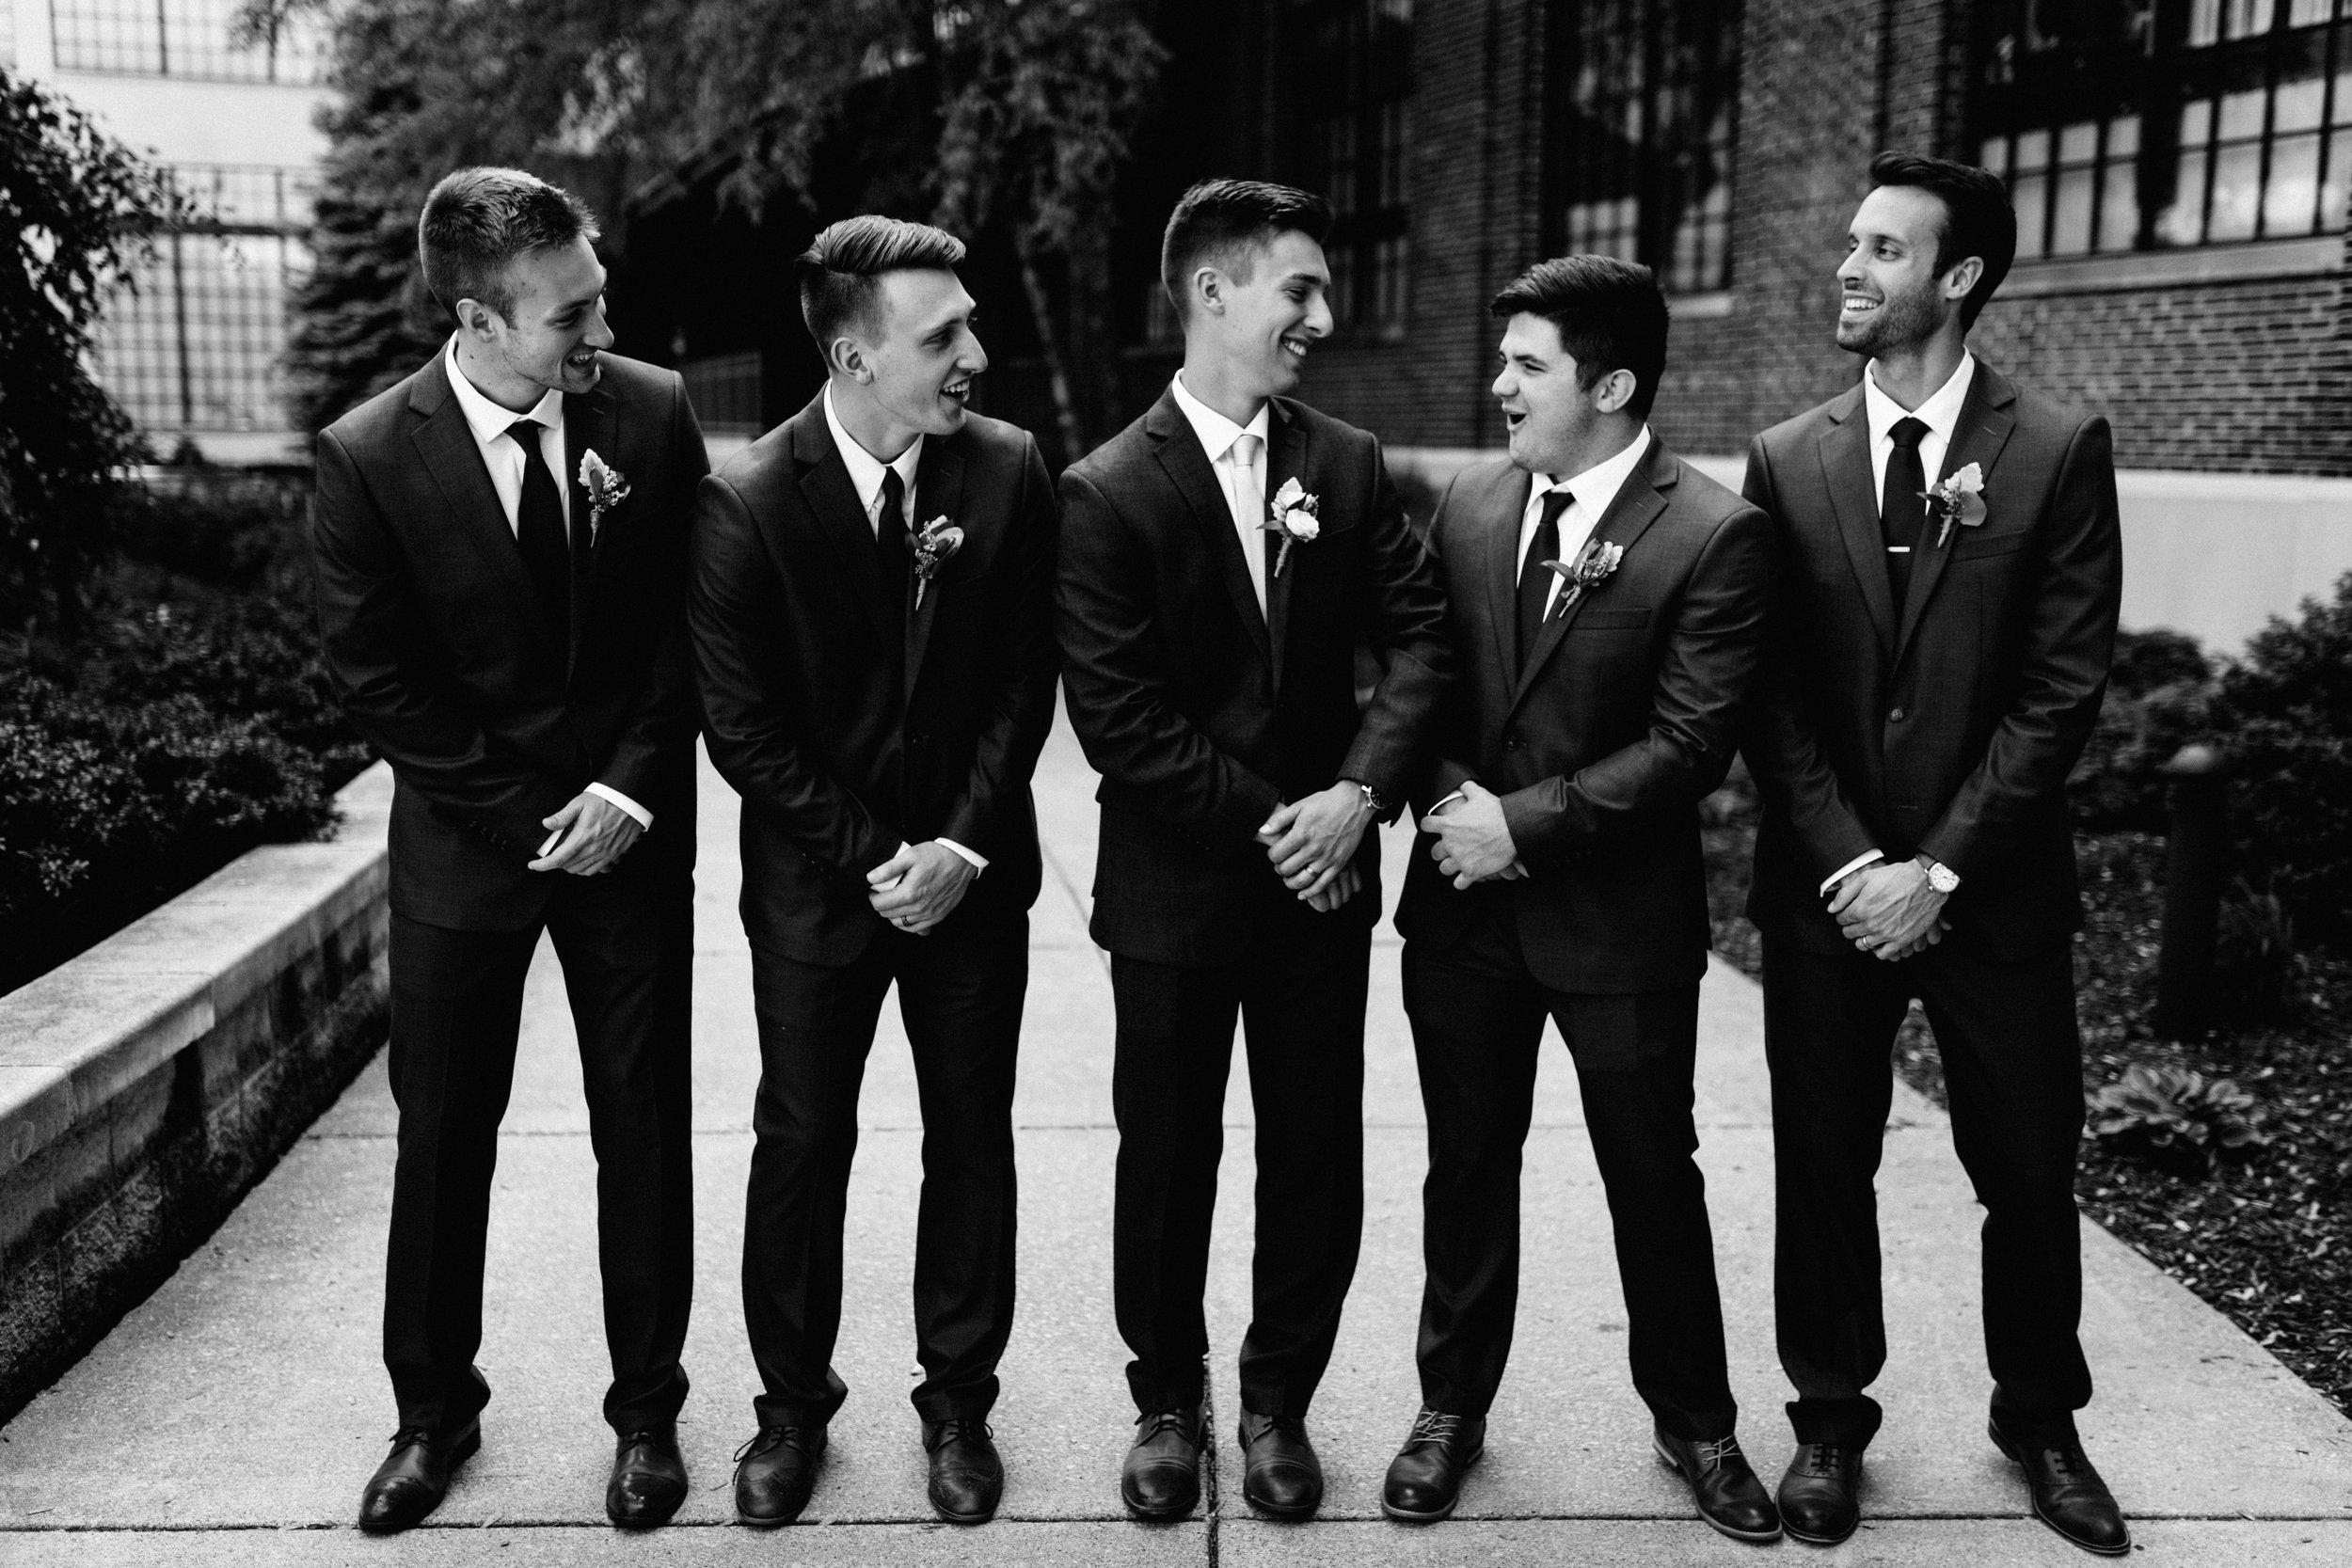 GRAYCENTOMHAMILTON-GRAND-RAPIDS-WEDDING-PHOTOGRAPHY-44.jpg